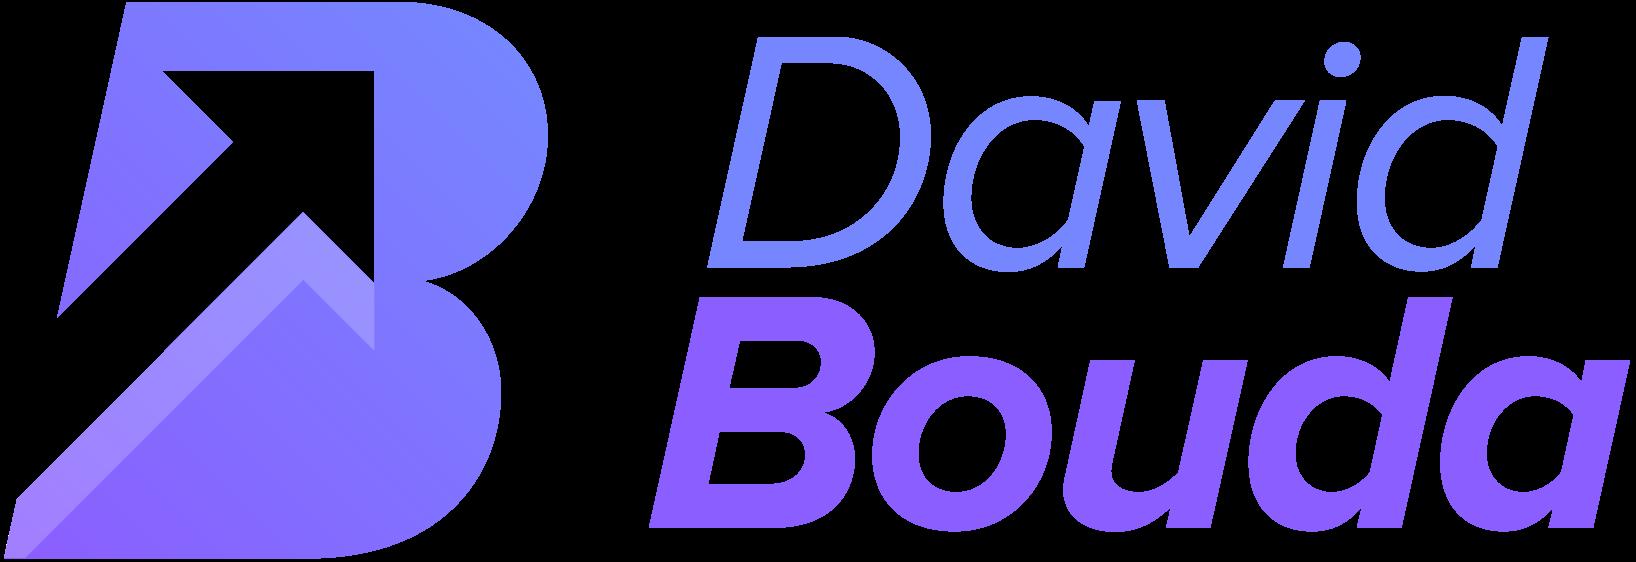 Davidbouda.cz